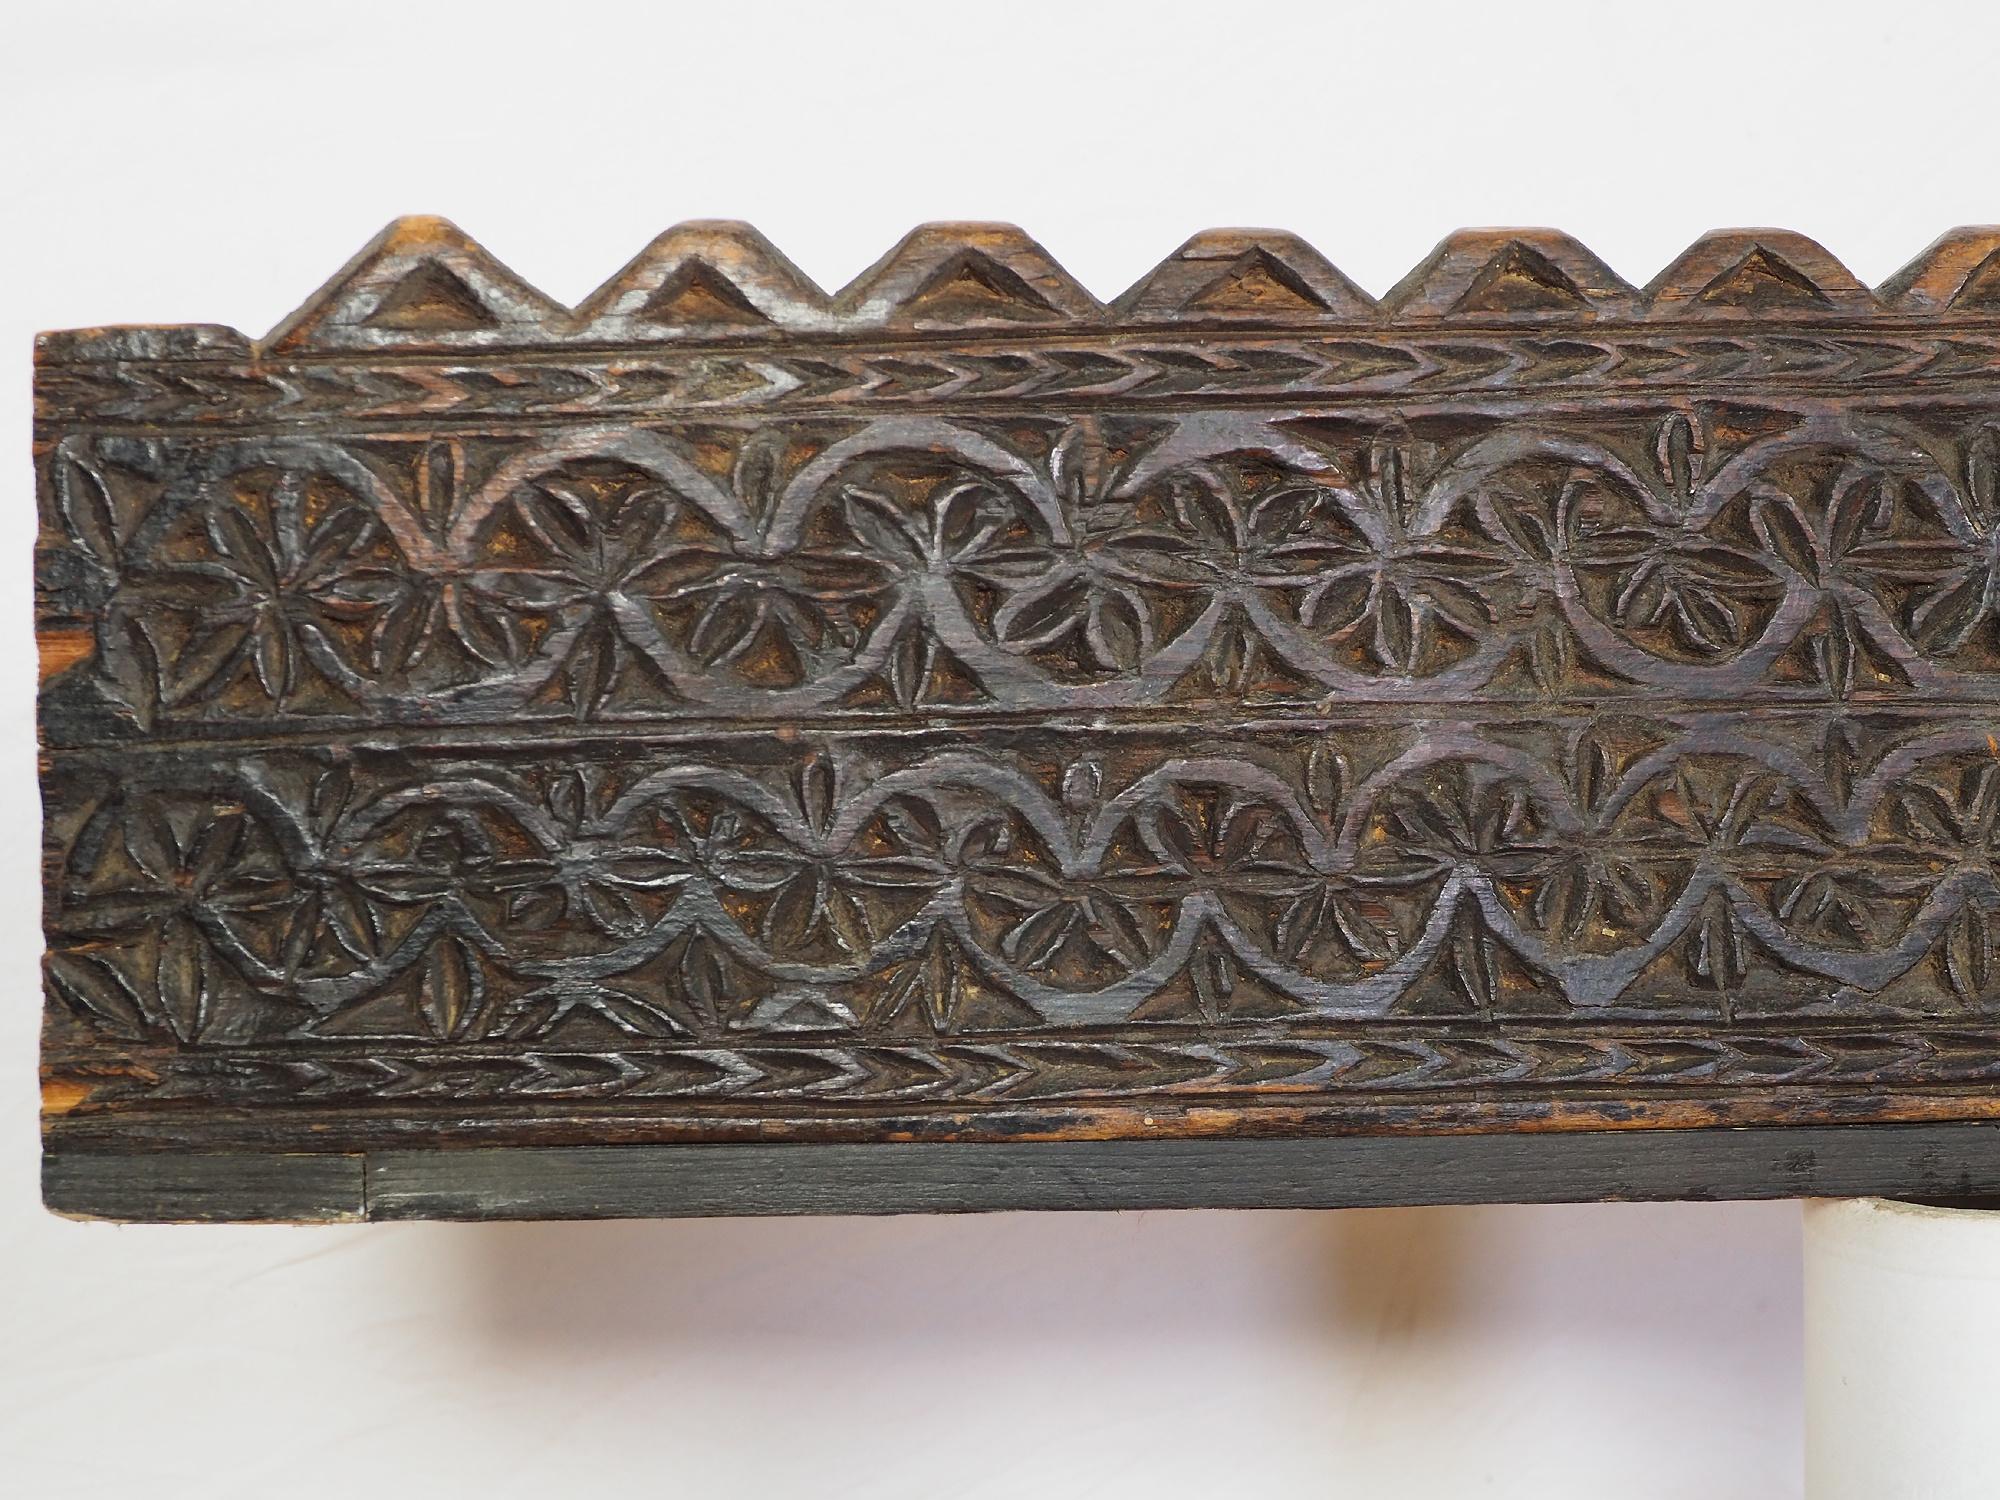 70 cm x 18 cm antik orient handgeschnitzte Massiv Holz Afghanistan Nuristan Panel Pakistan Swat-Valley 18/19 Jh. Nr:20/B